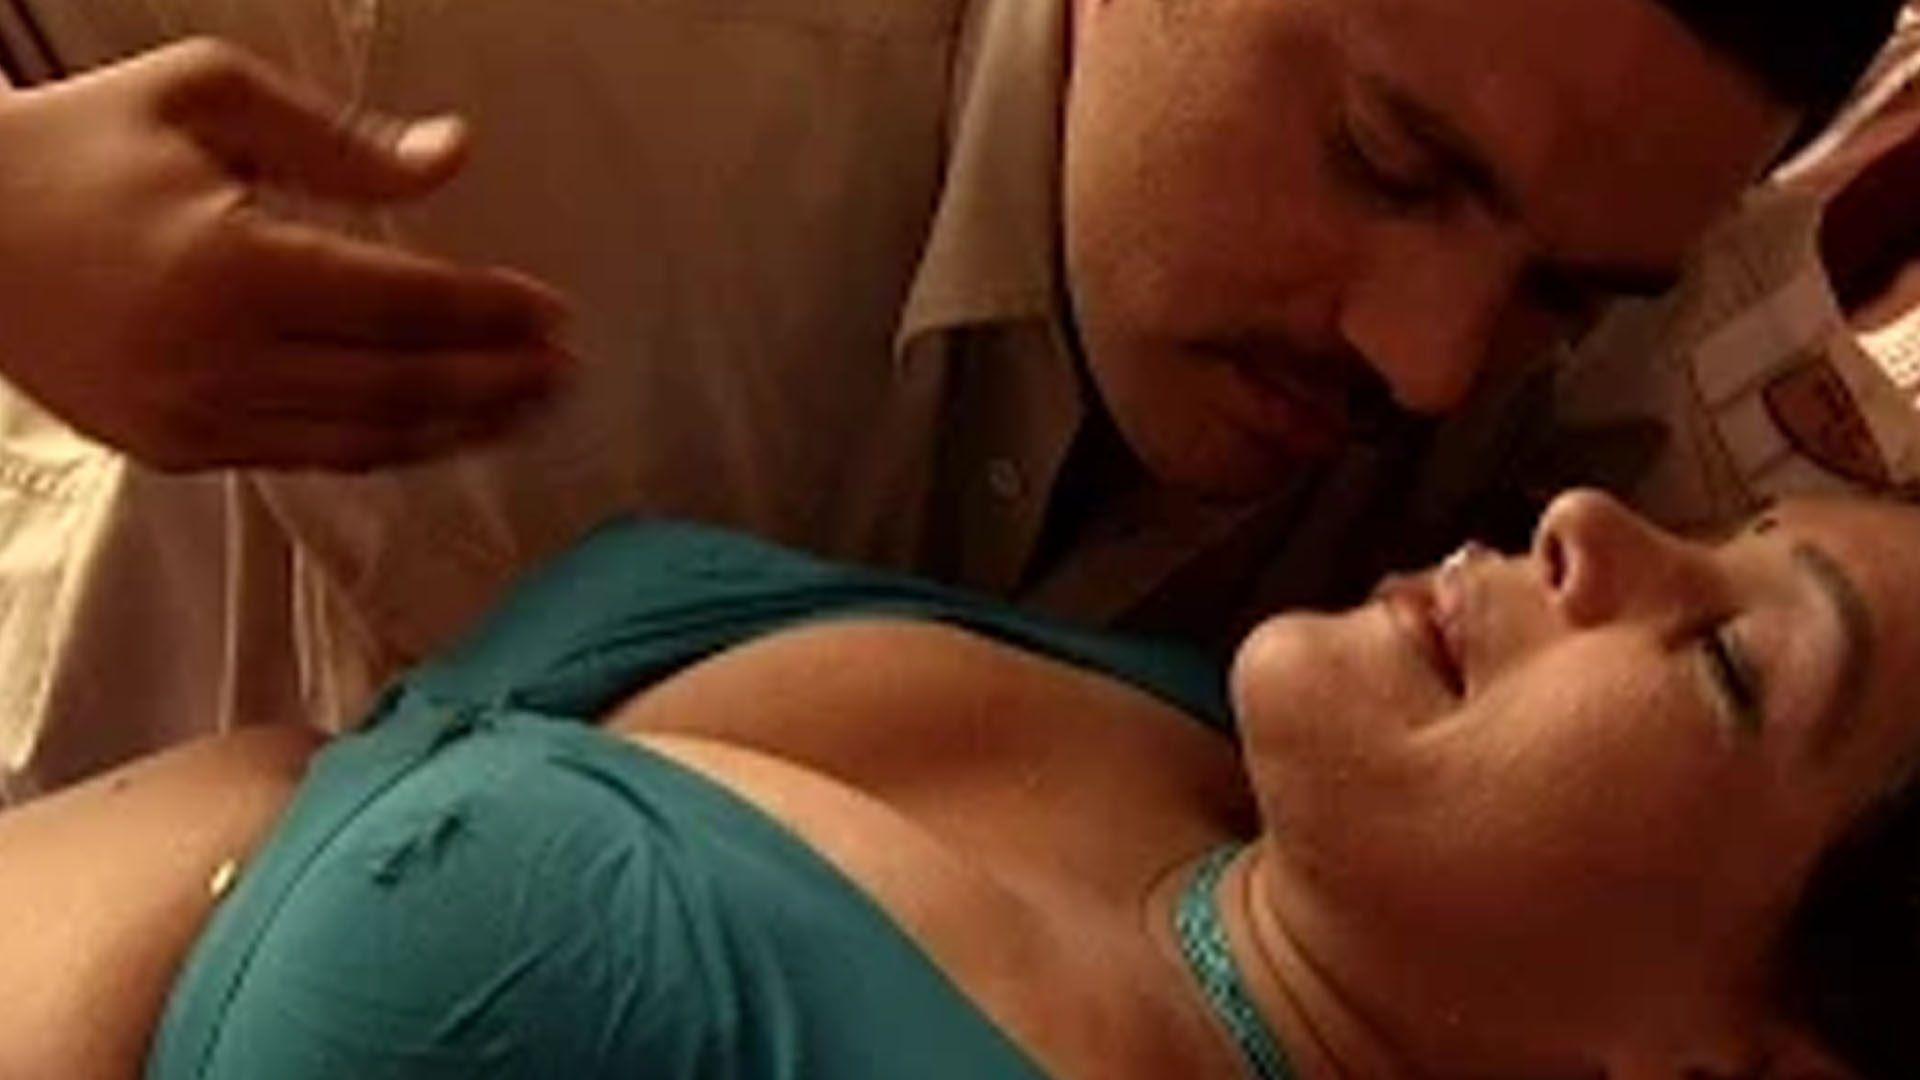 युवा जोड़े कठिन रोमांस || YOUNG COUPLE HARD ROMANCE || HINDI HOT SHORT F...